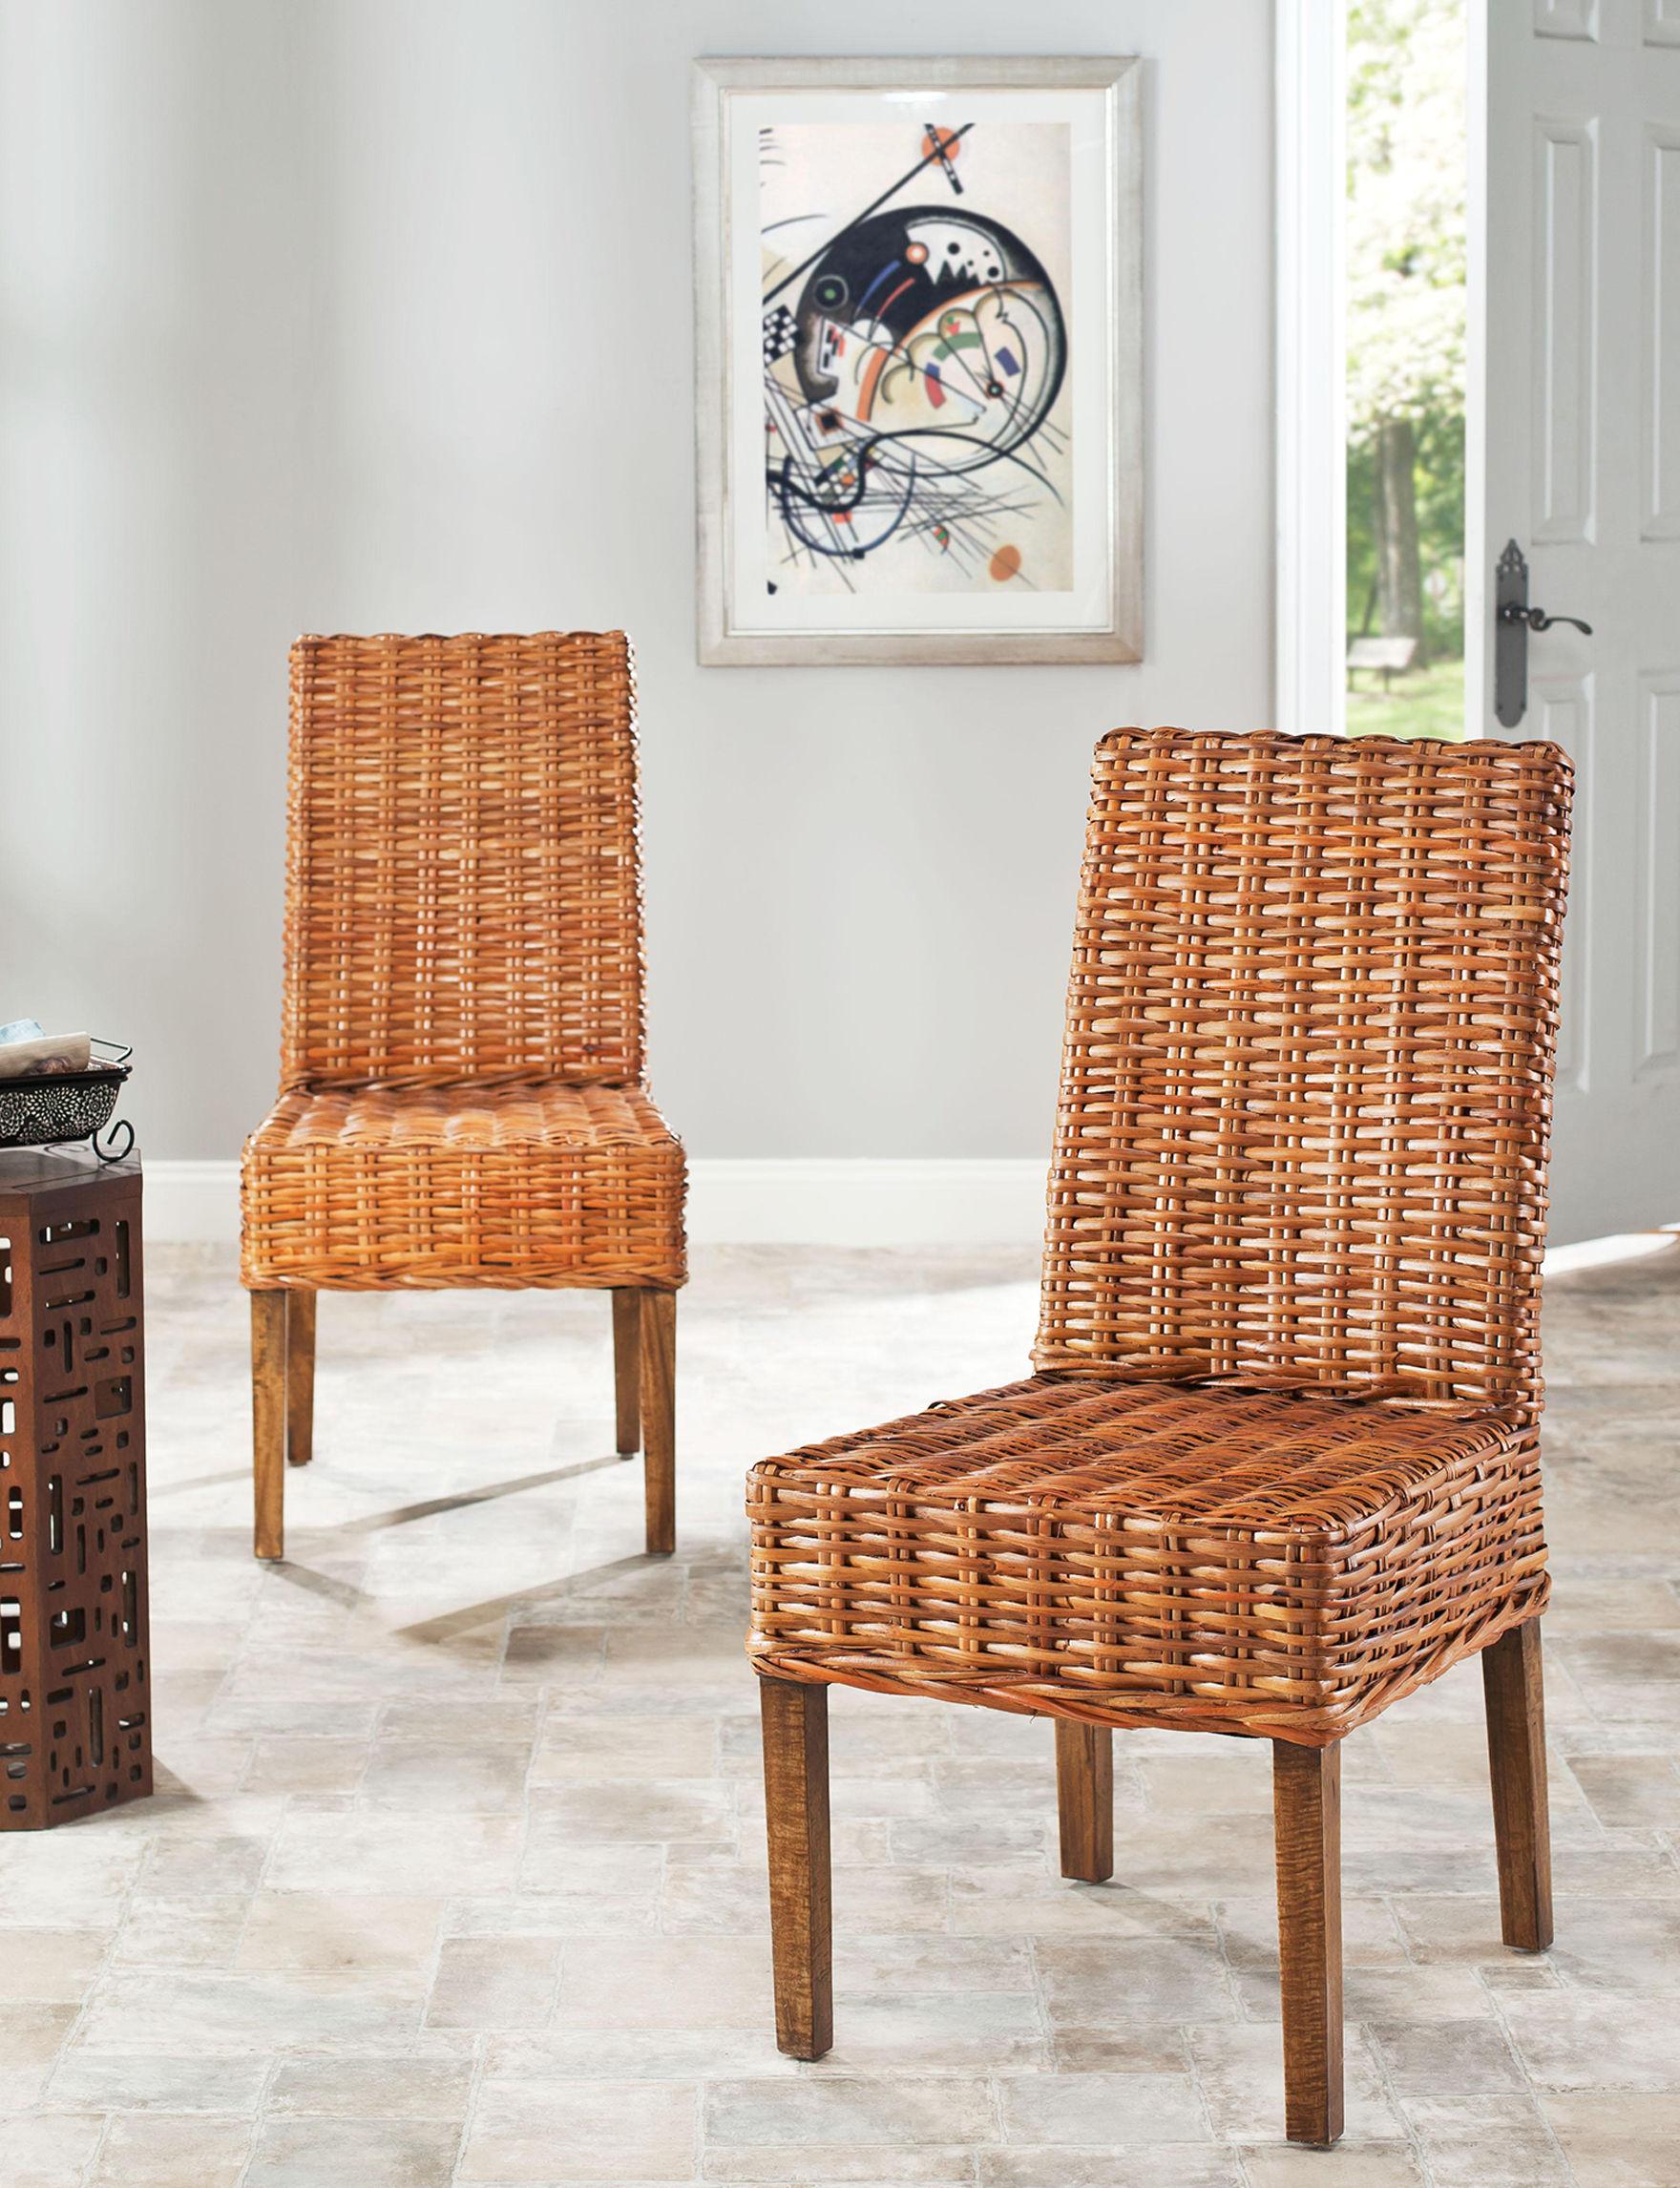 Safavieh Honey Accent Chairs Kitchen & Dining Furniture